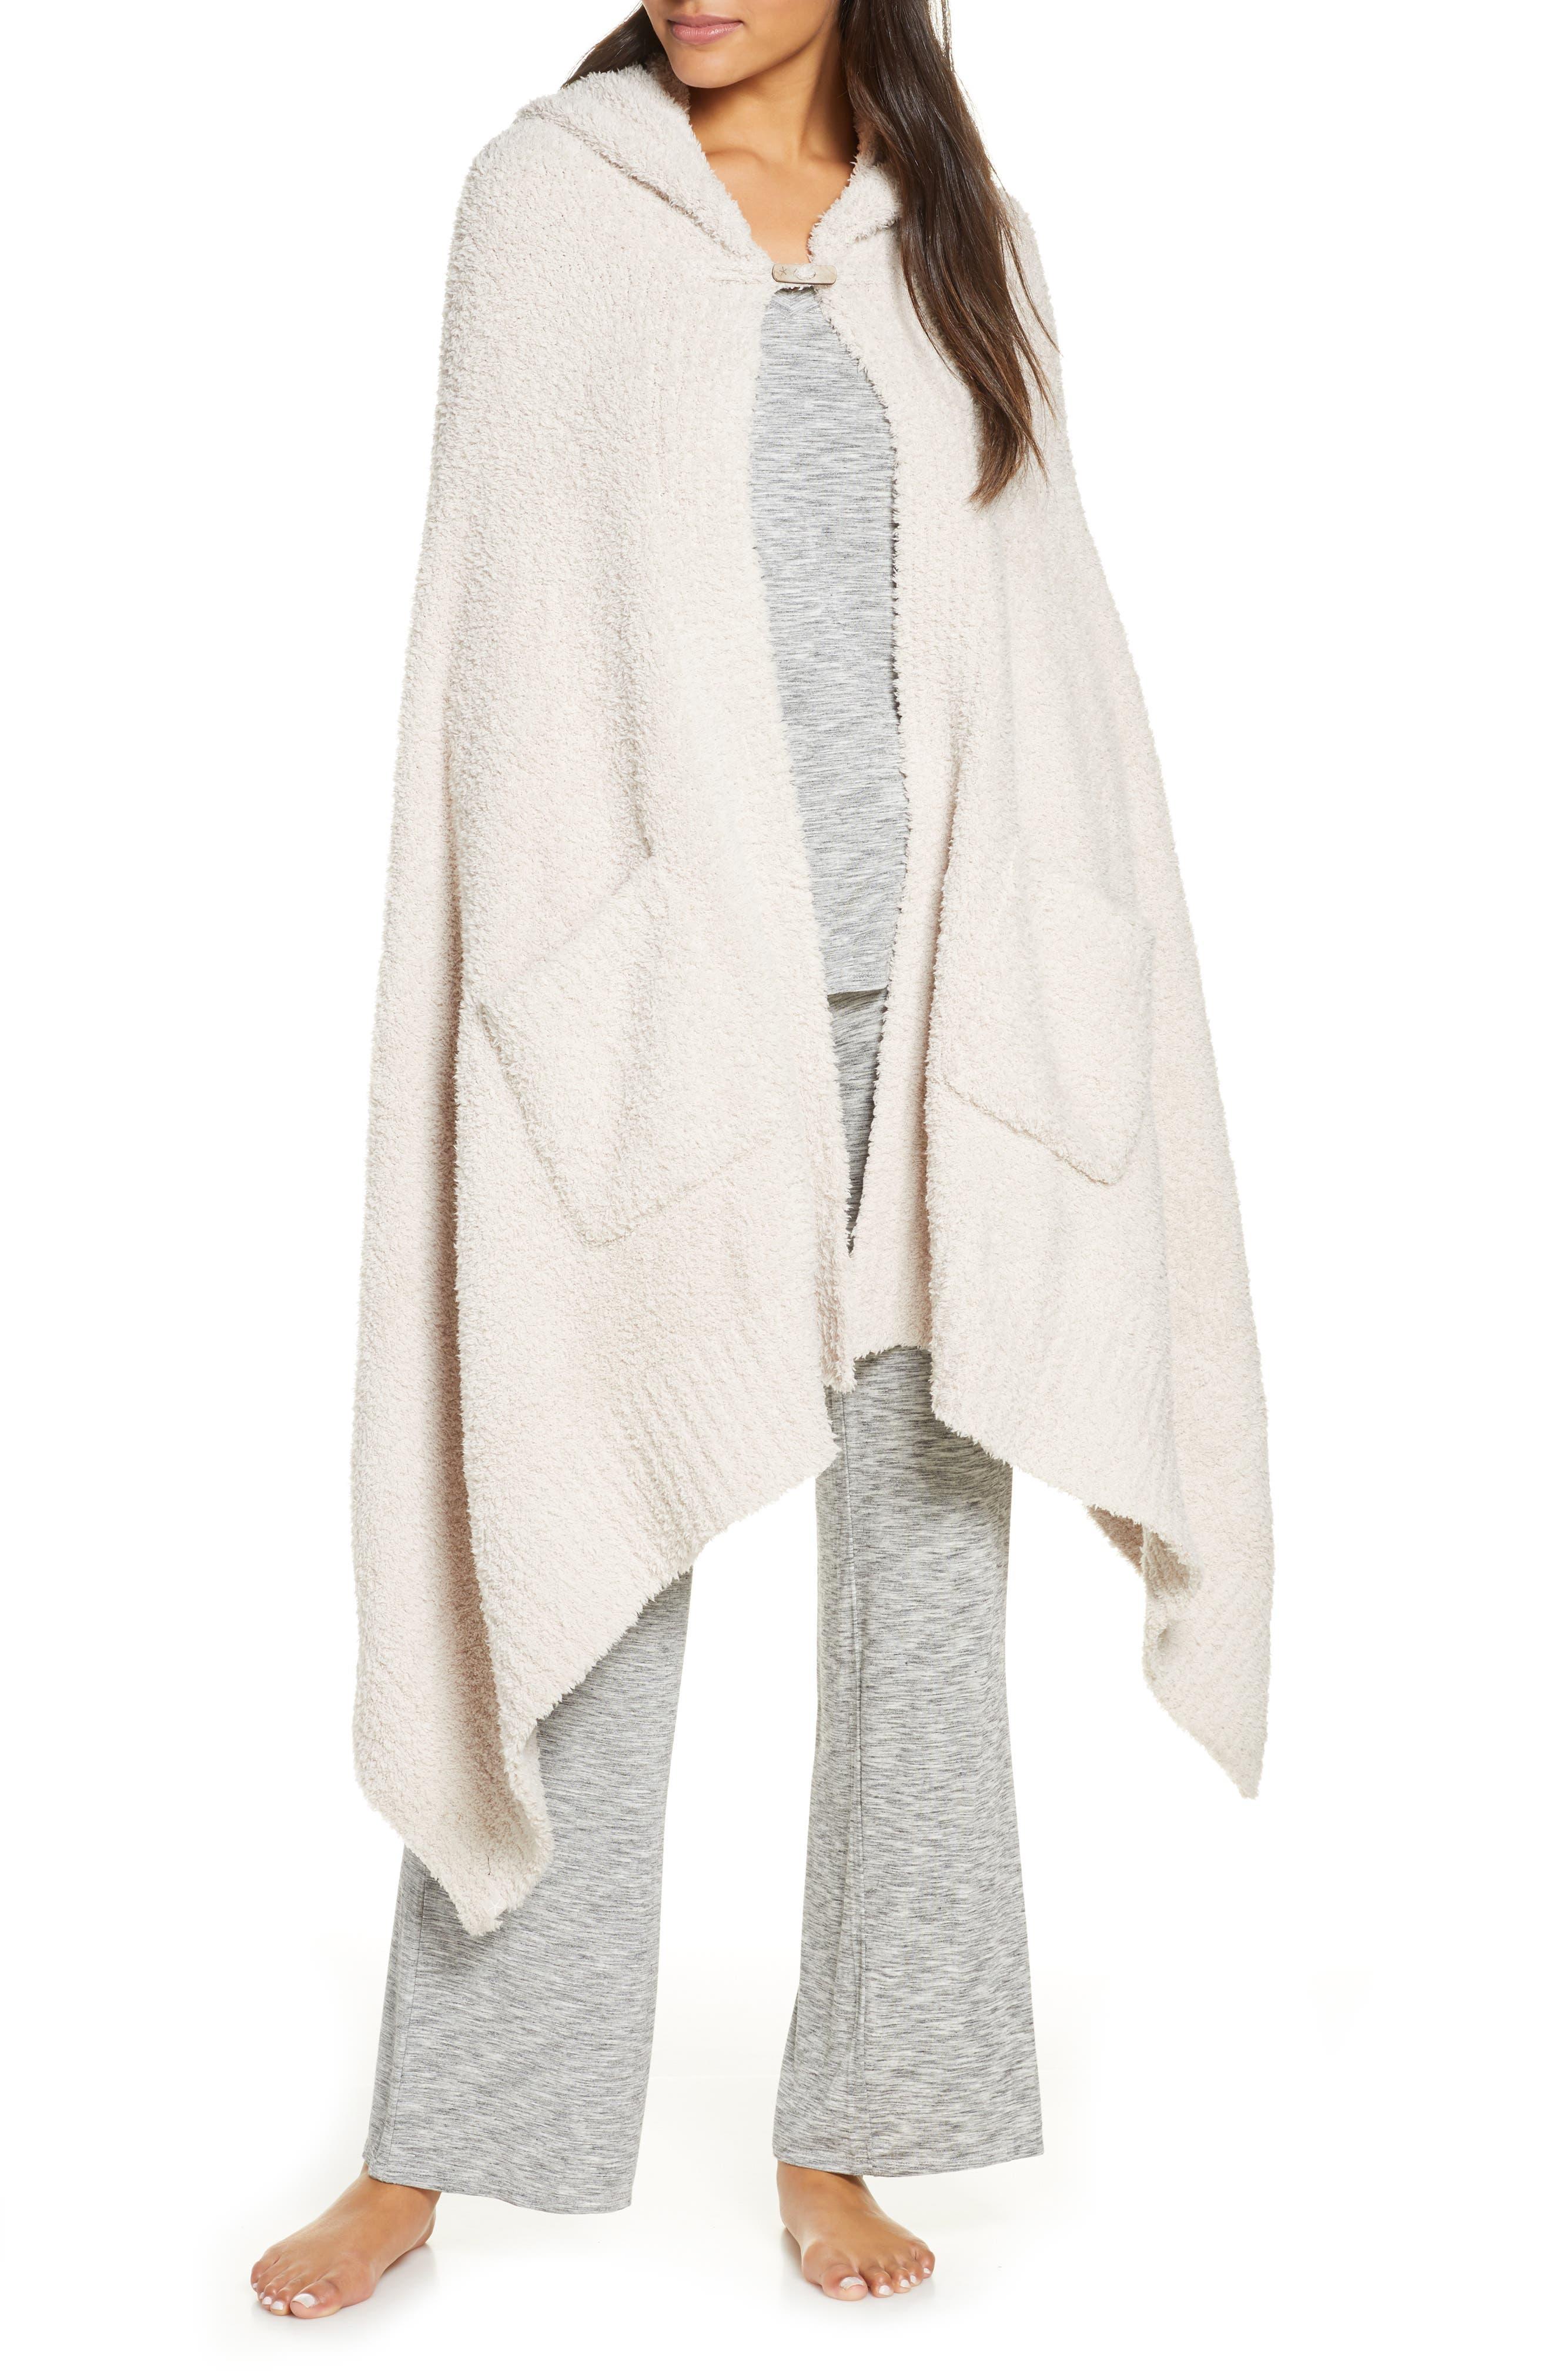 Image of Barefoot Dreams CozyChic Hooded Pocket Shawl